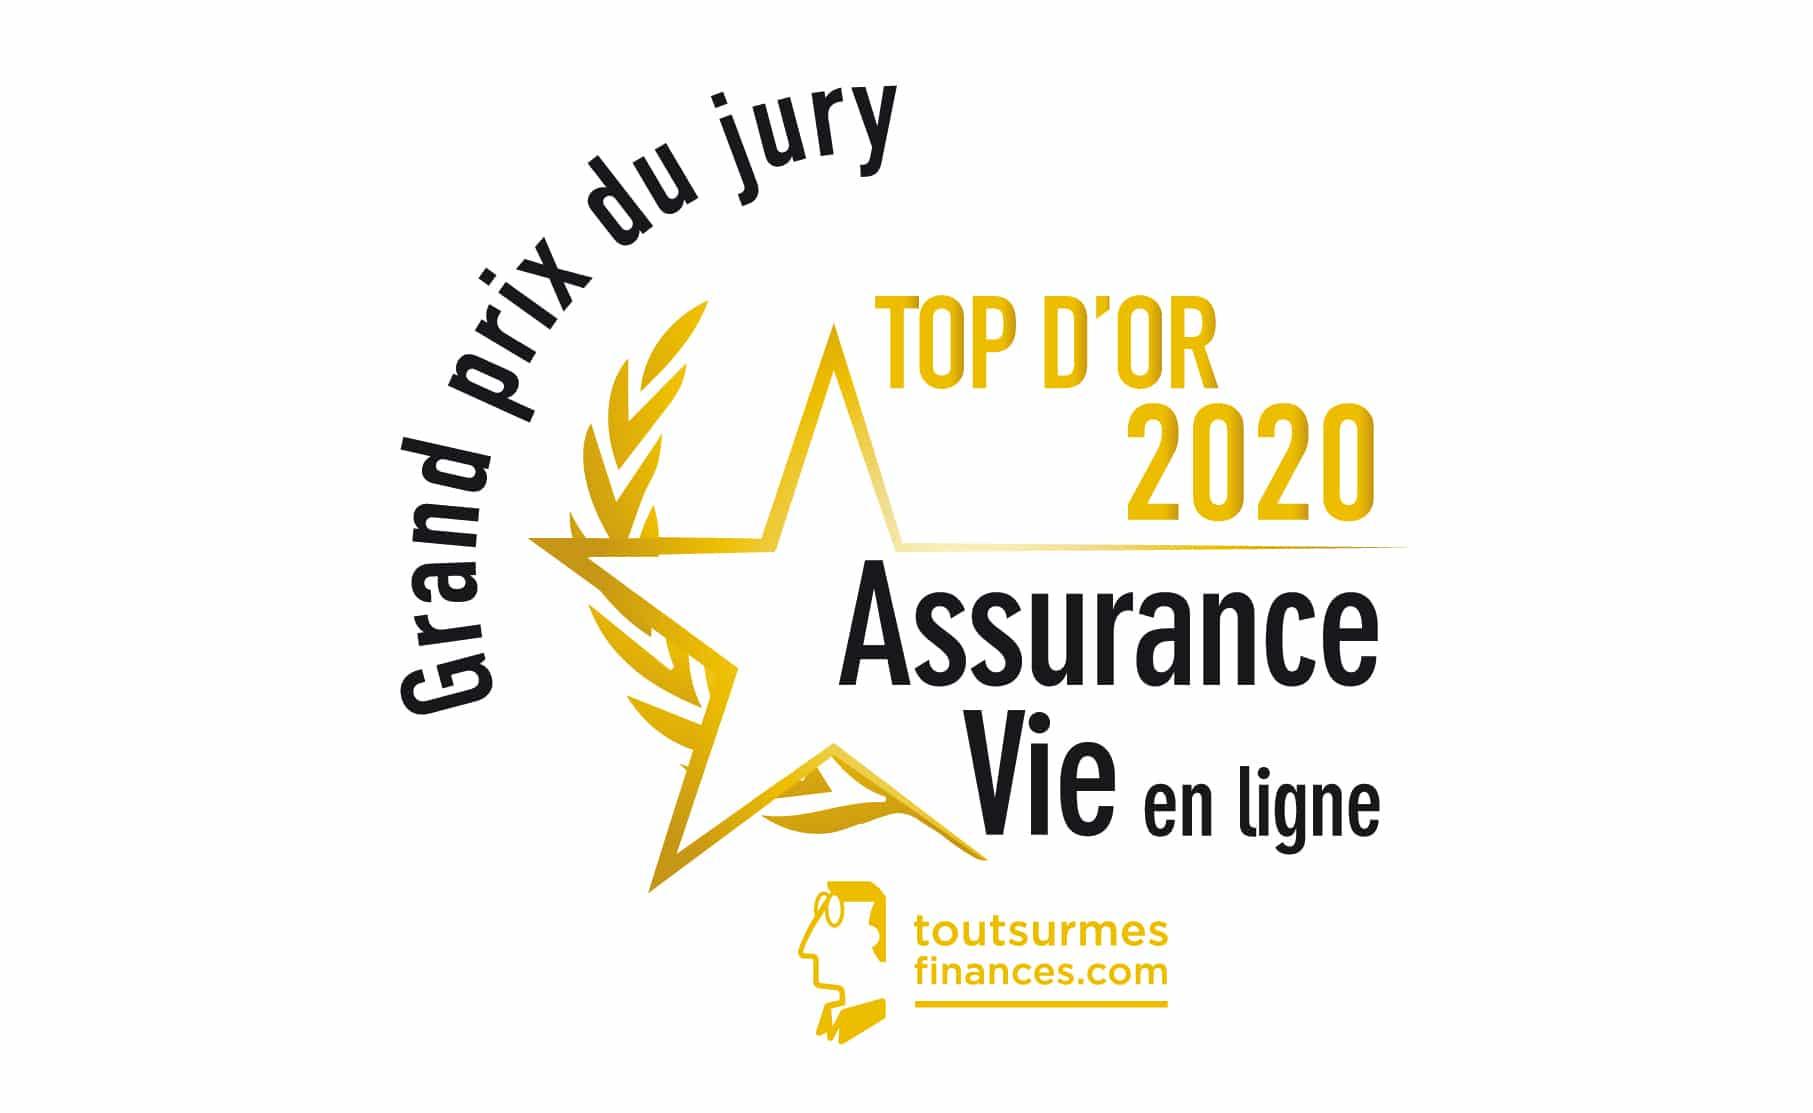 Top d'Or – Grand Prix du Jury